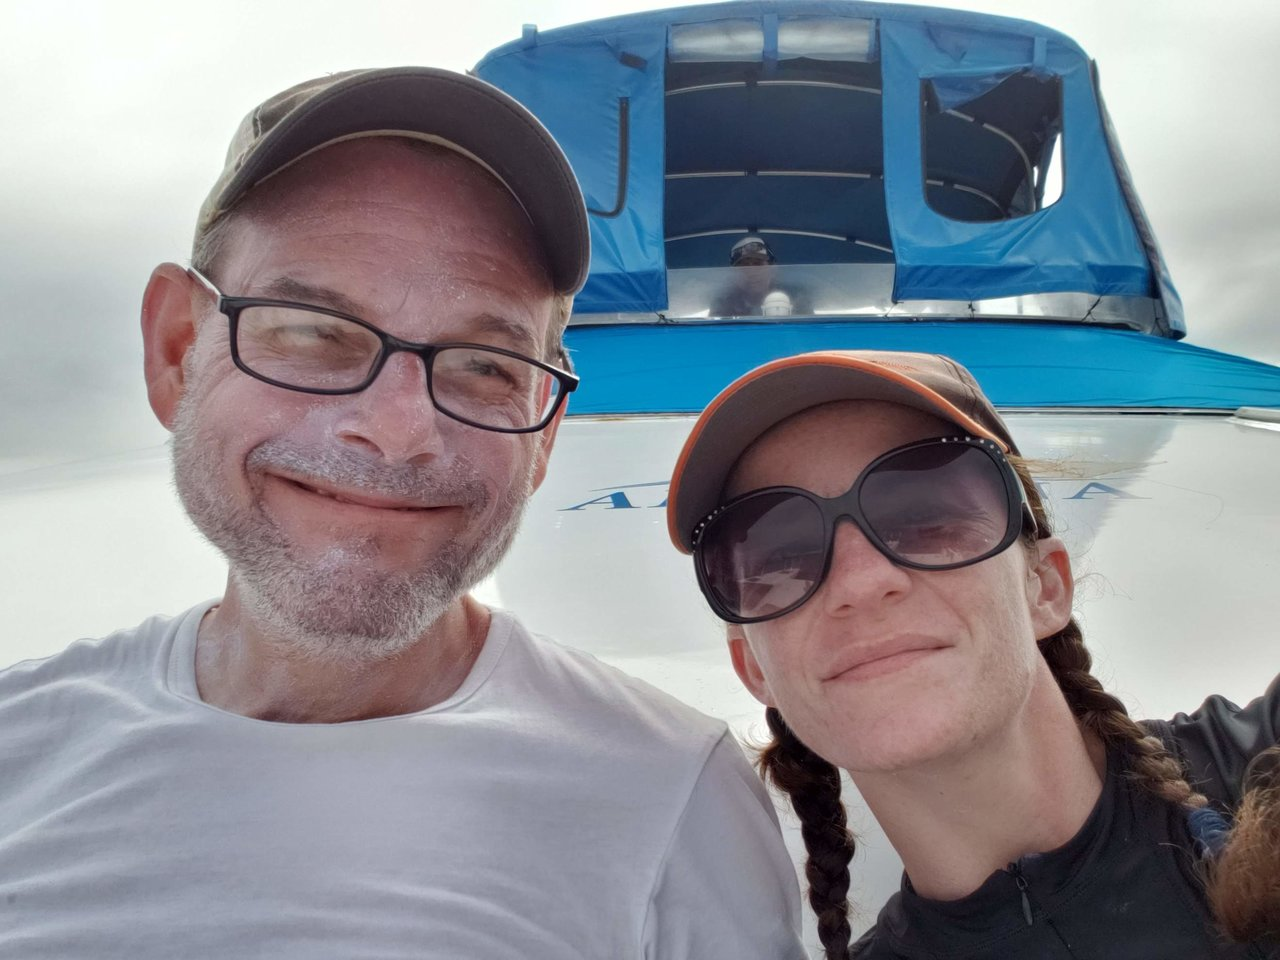 Boat ride to Sombrero Chino and Bahia Sullivan | Photo taken by Peter S